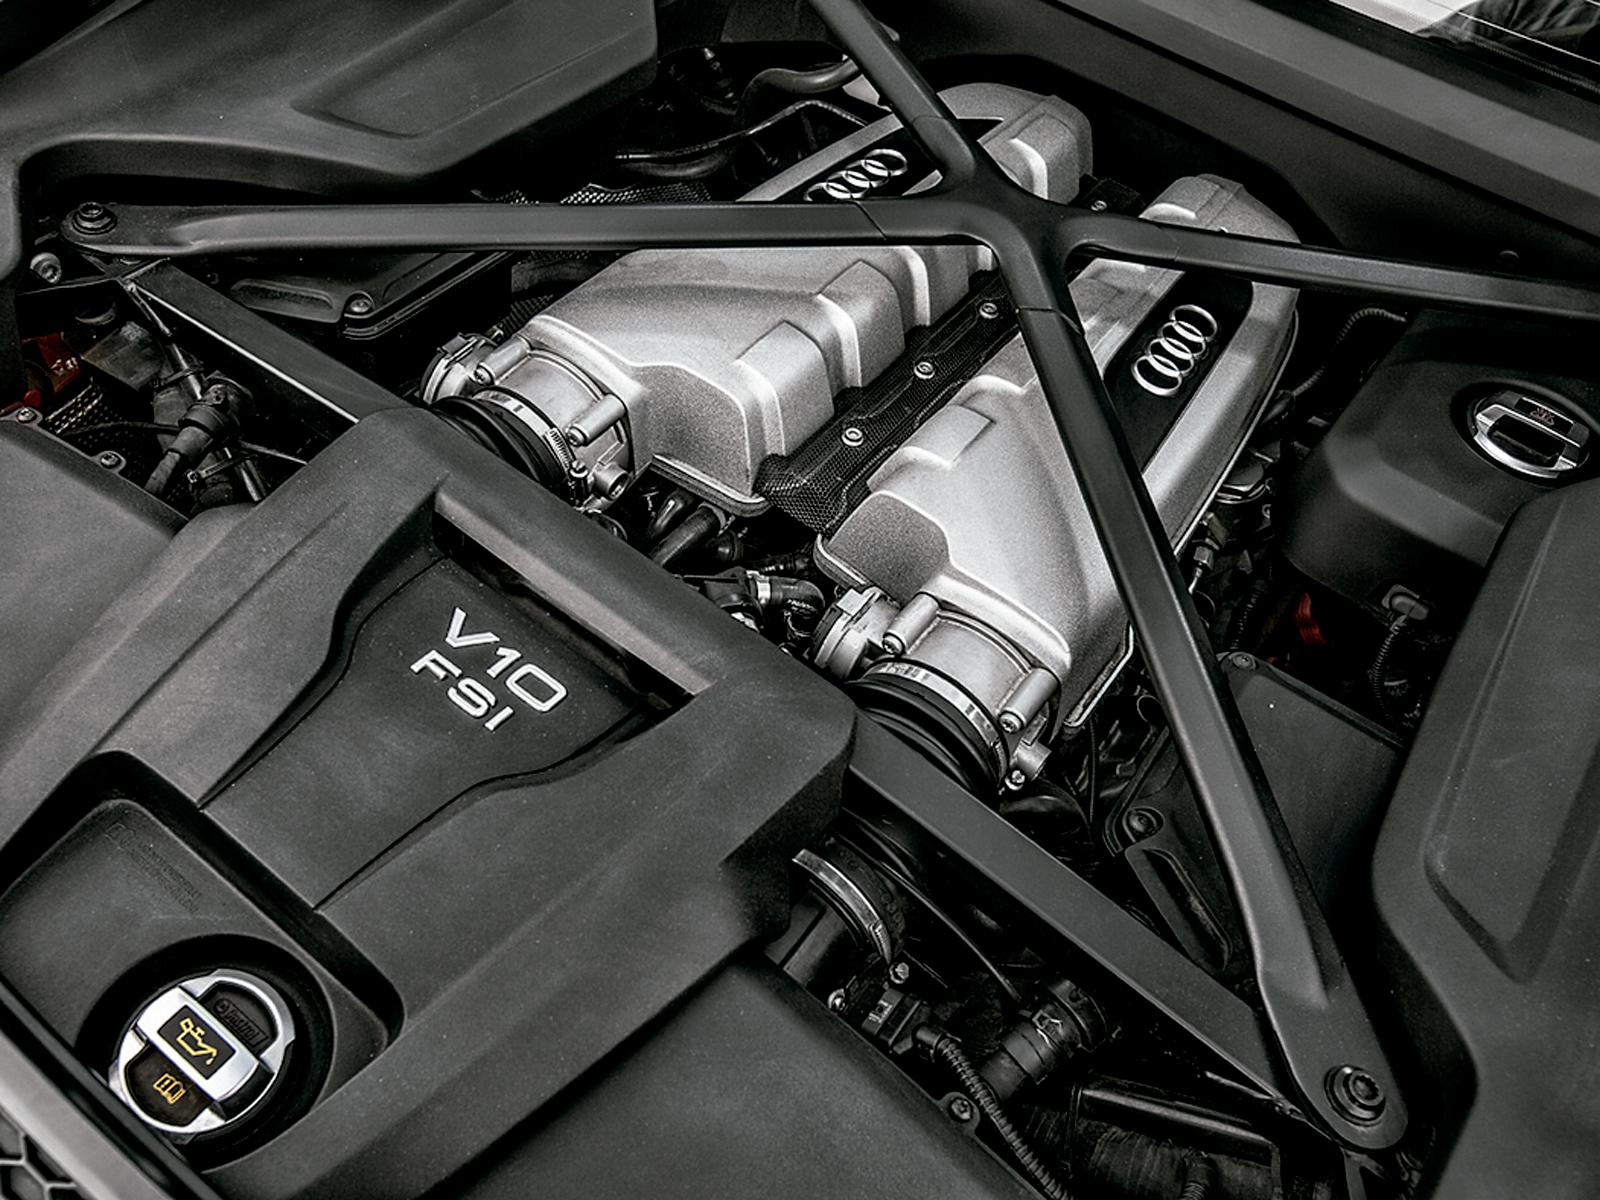 Motor V10 está na parte central traseira